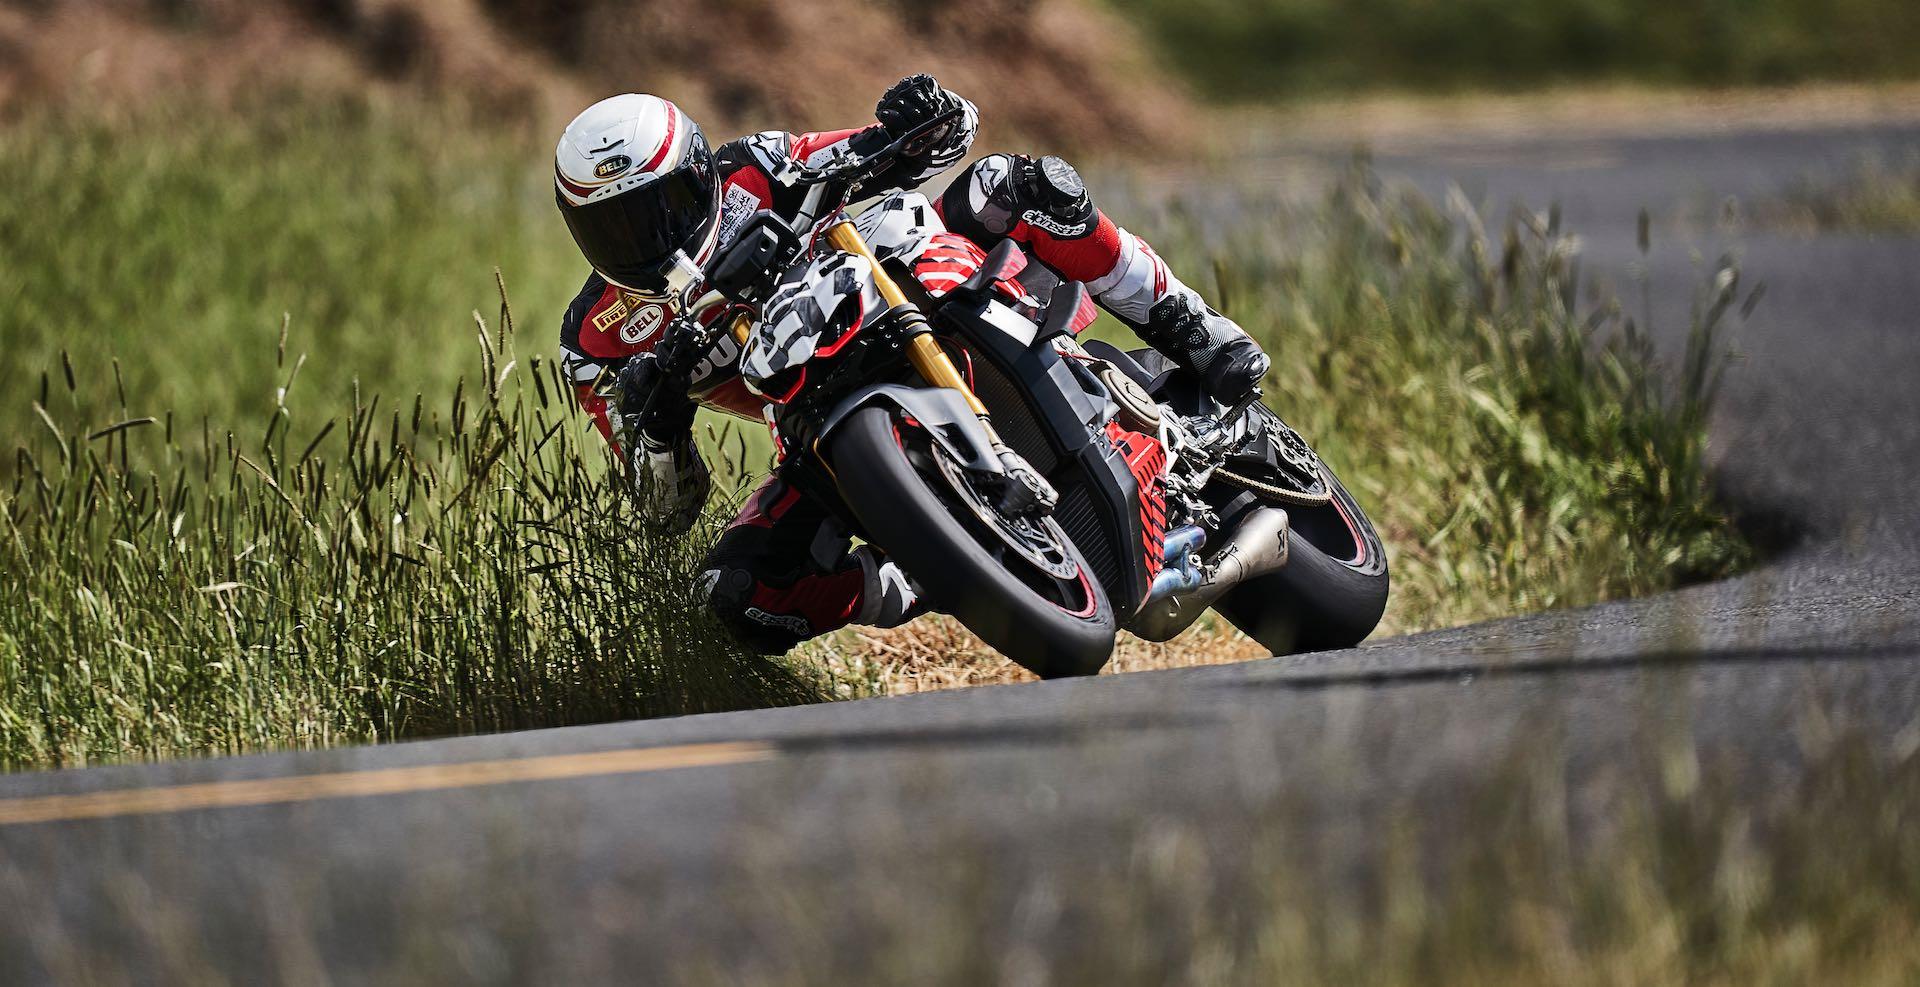 Carlin Dunne on Ducati Streetfighter V4